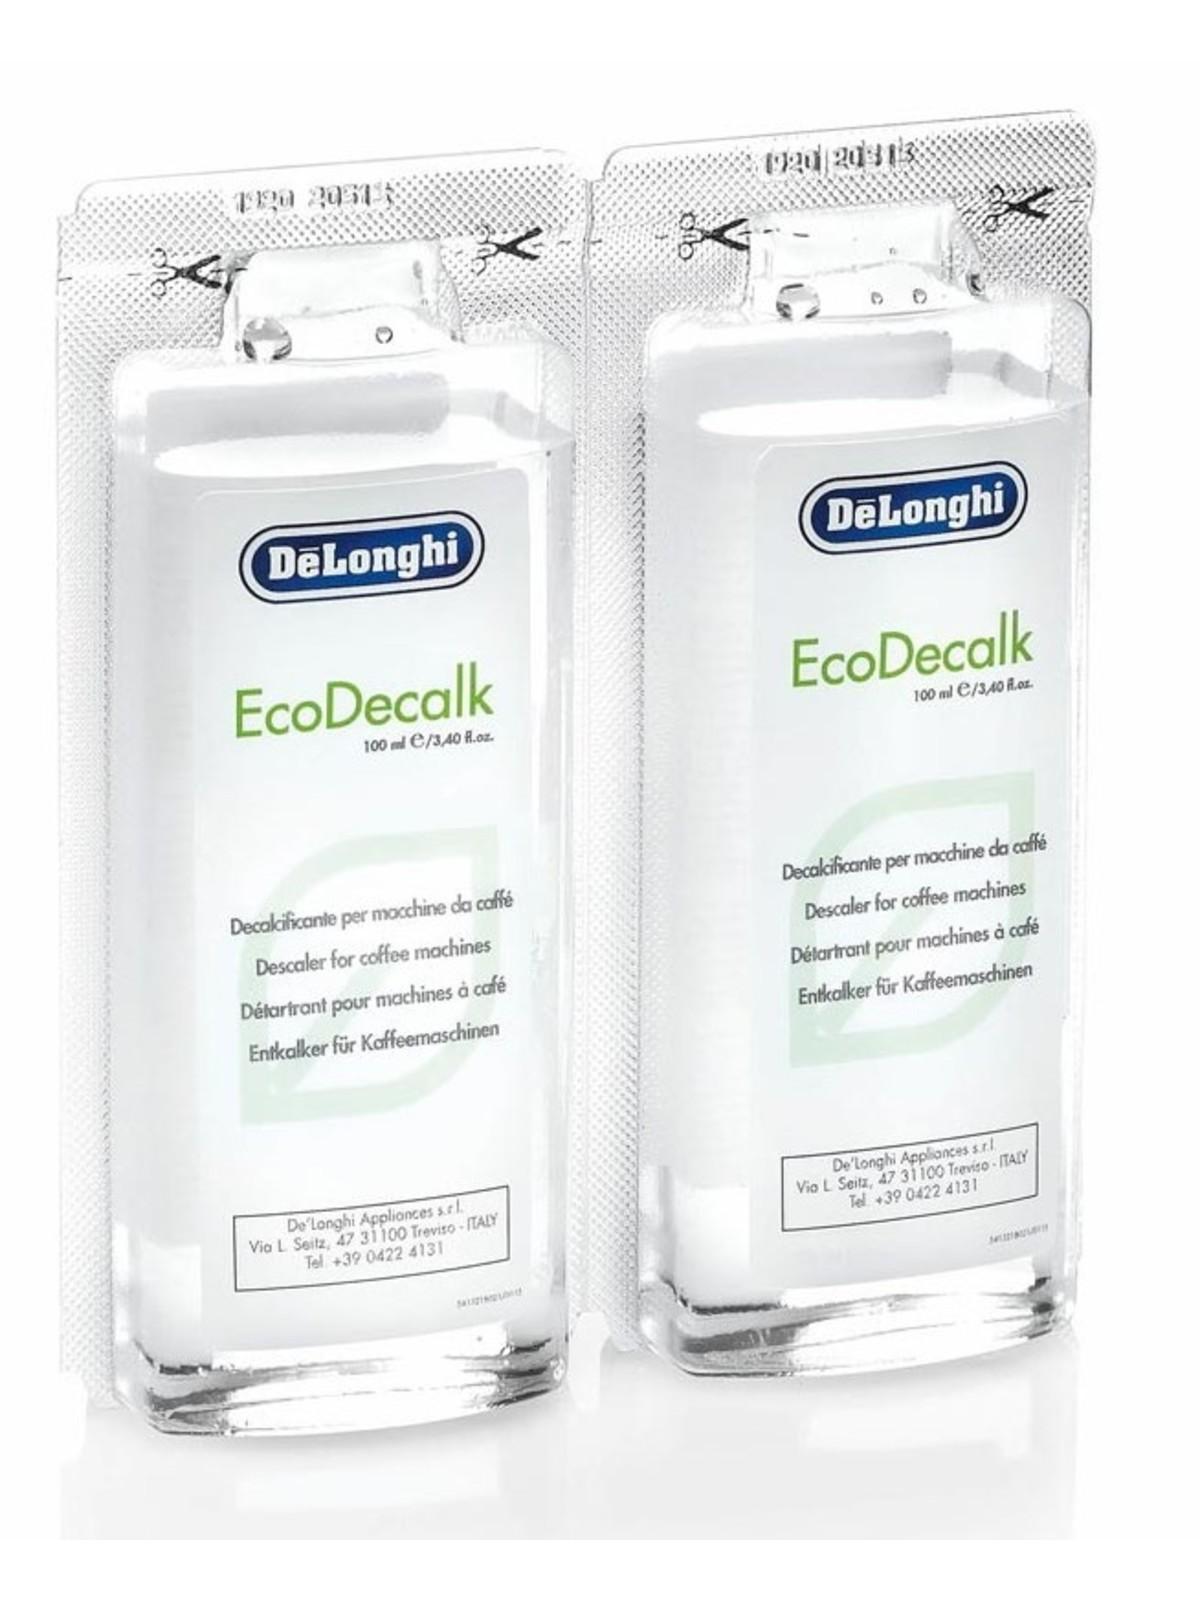 DELONGHI EcoDecalk Mini 2 x 100ml Descaler Pack of 1